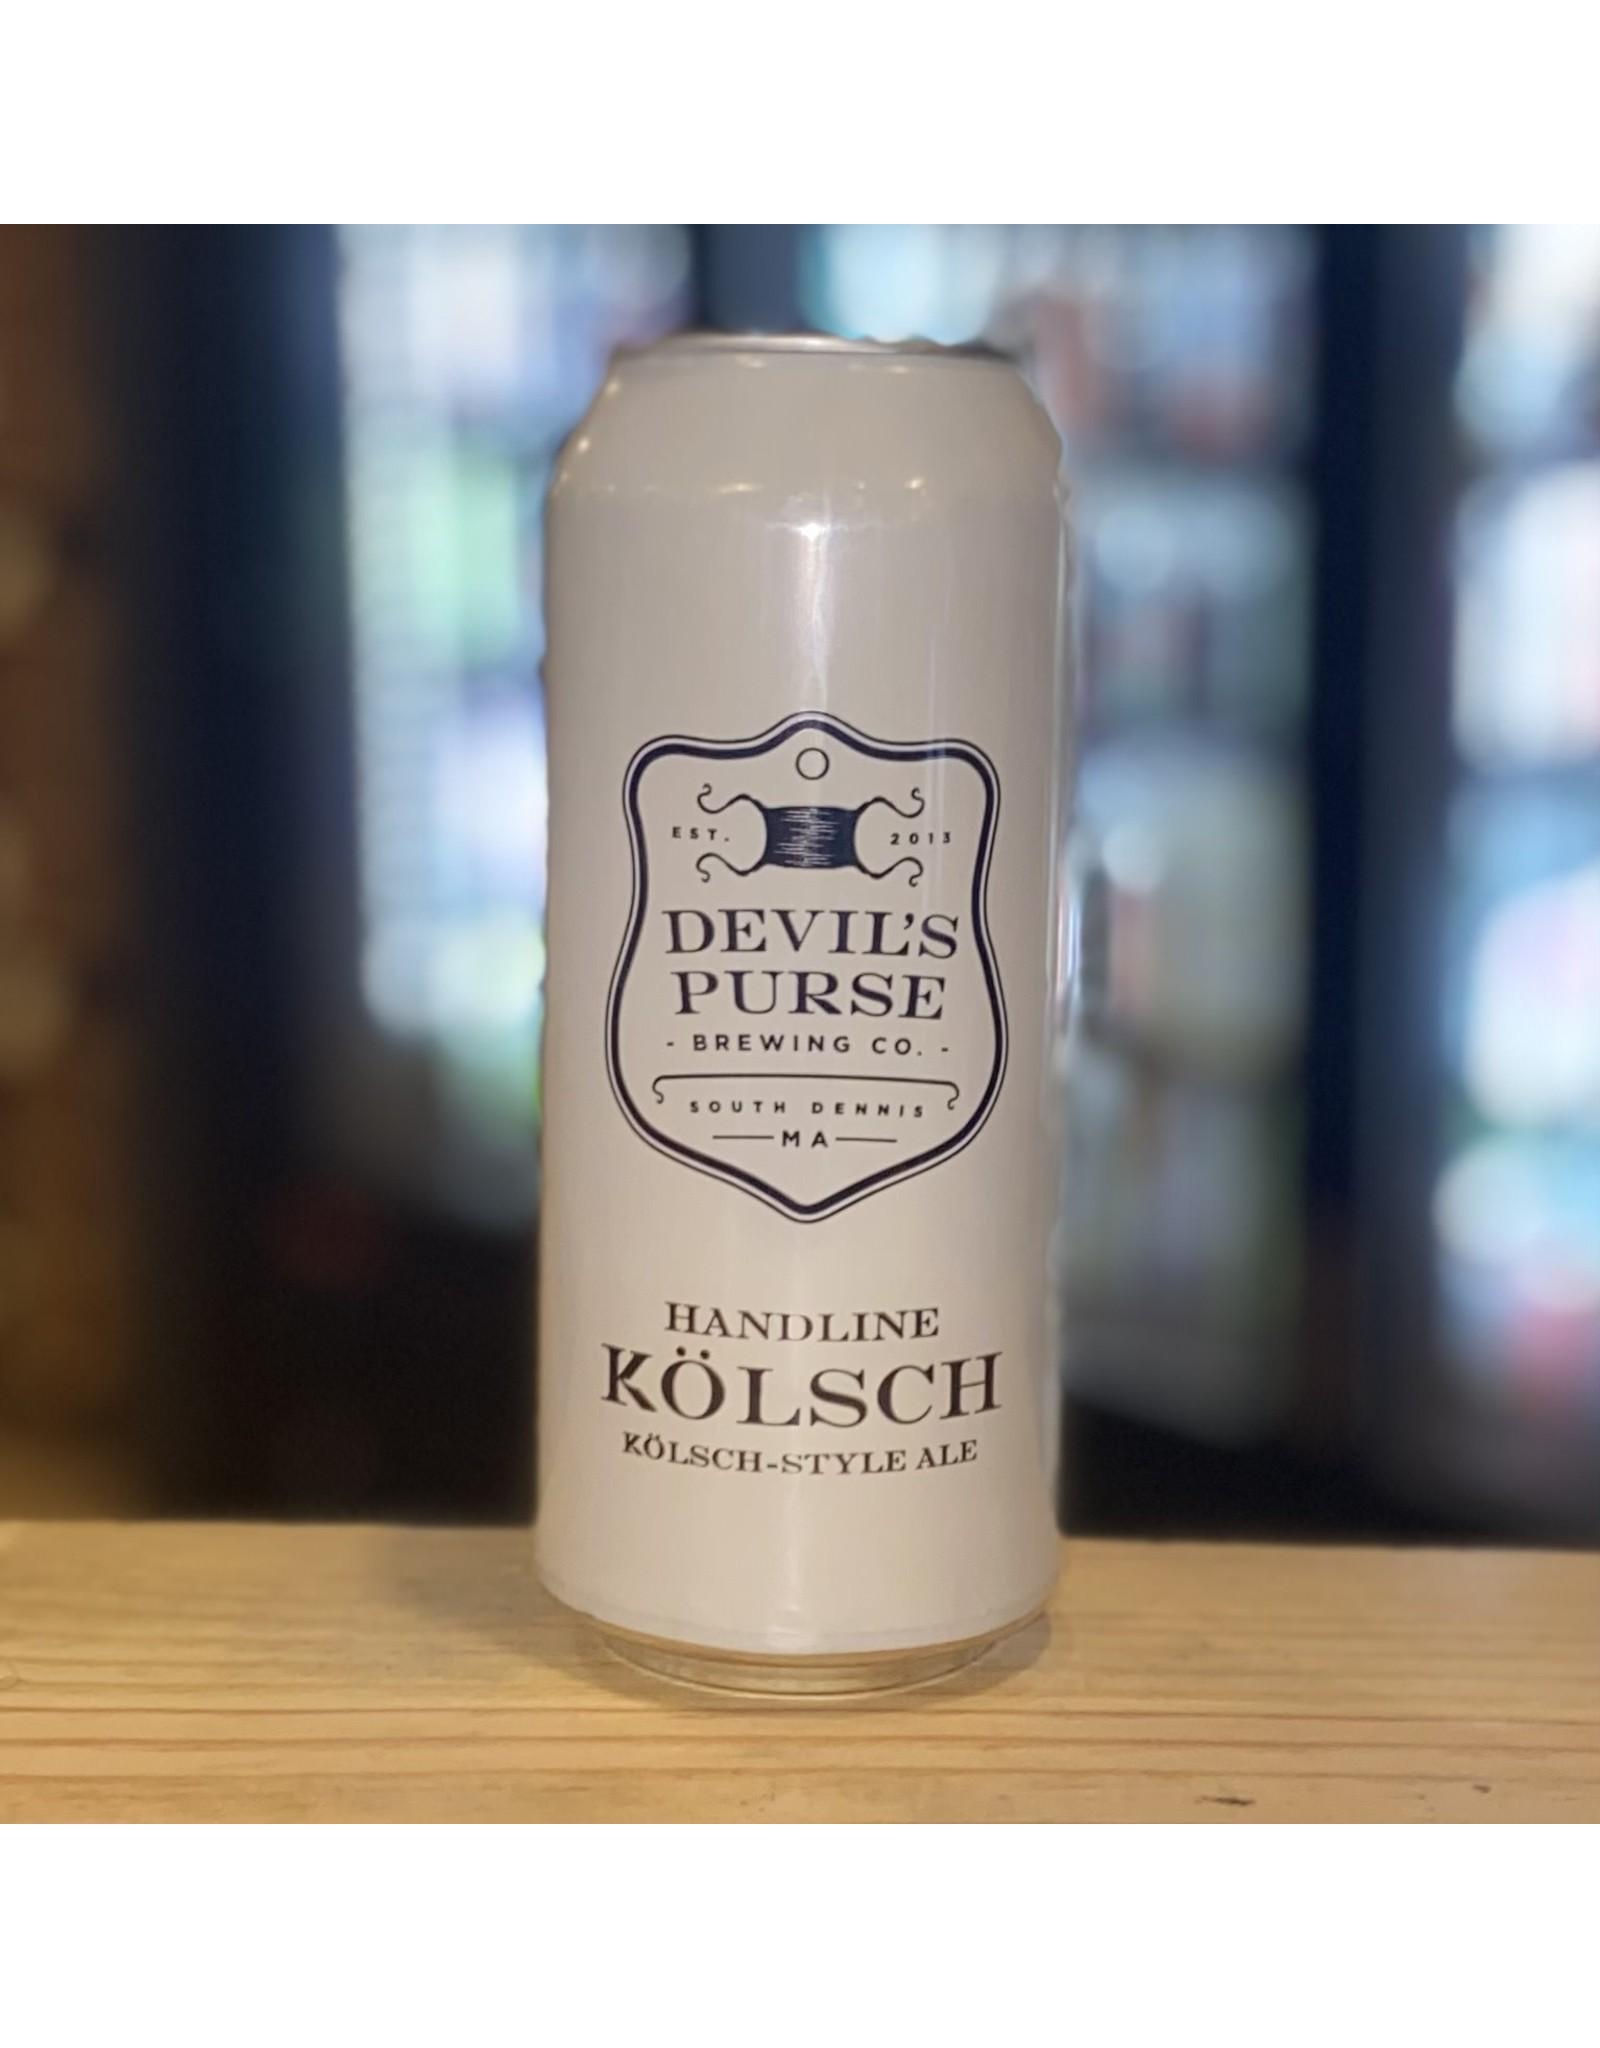 "Kolsch Devil's Purse ""Handline"" Kolsch - South Dennis, MA"